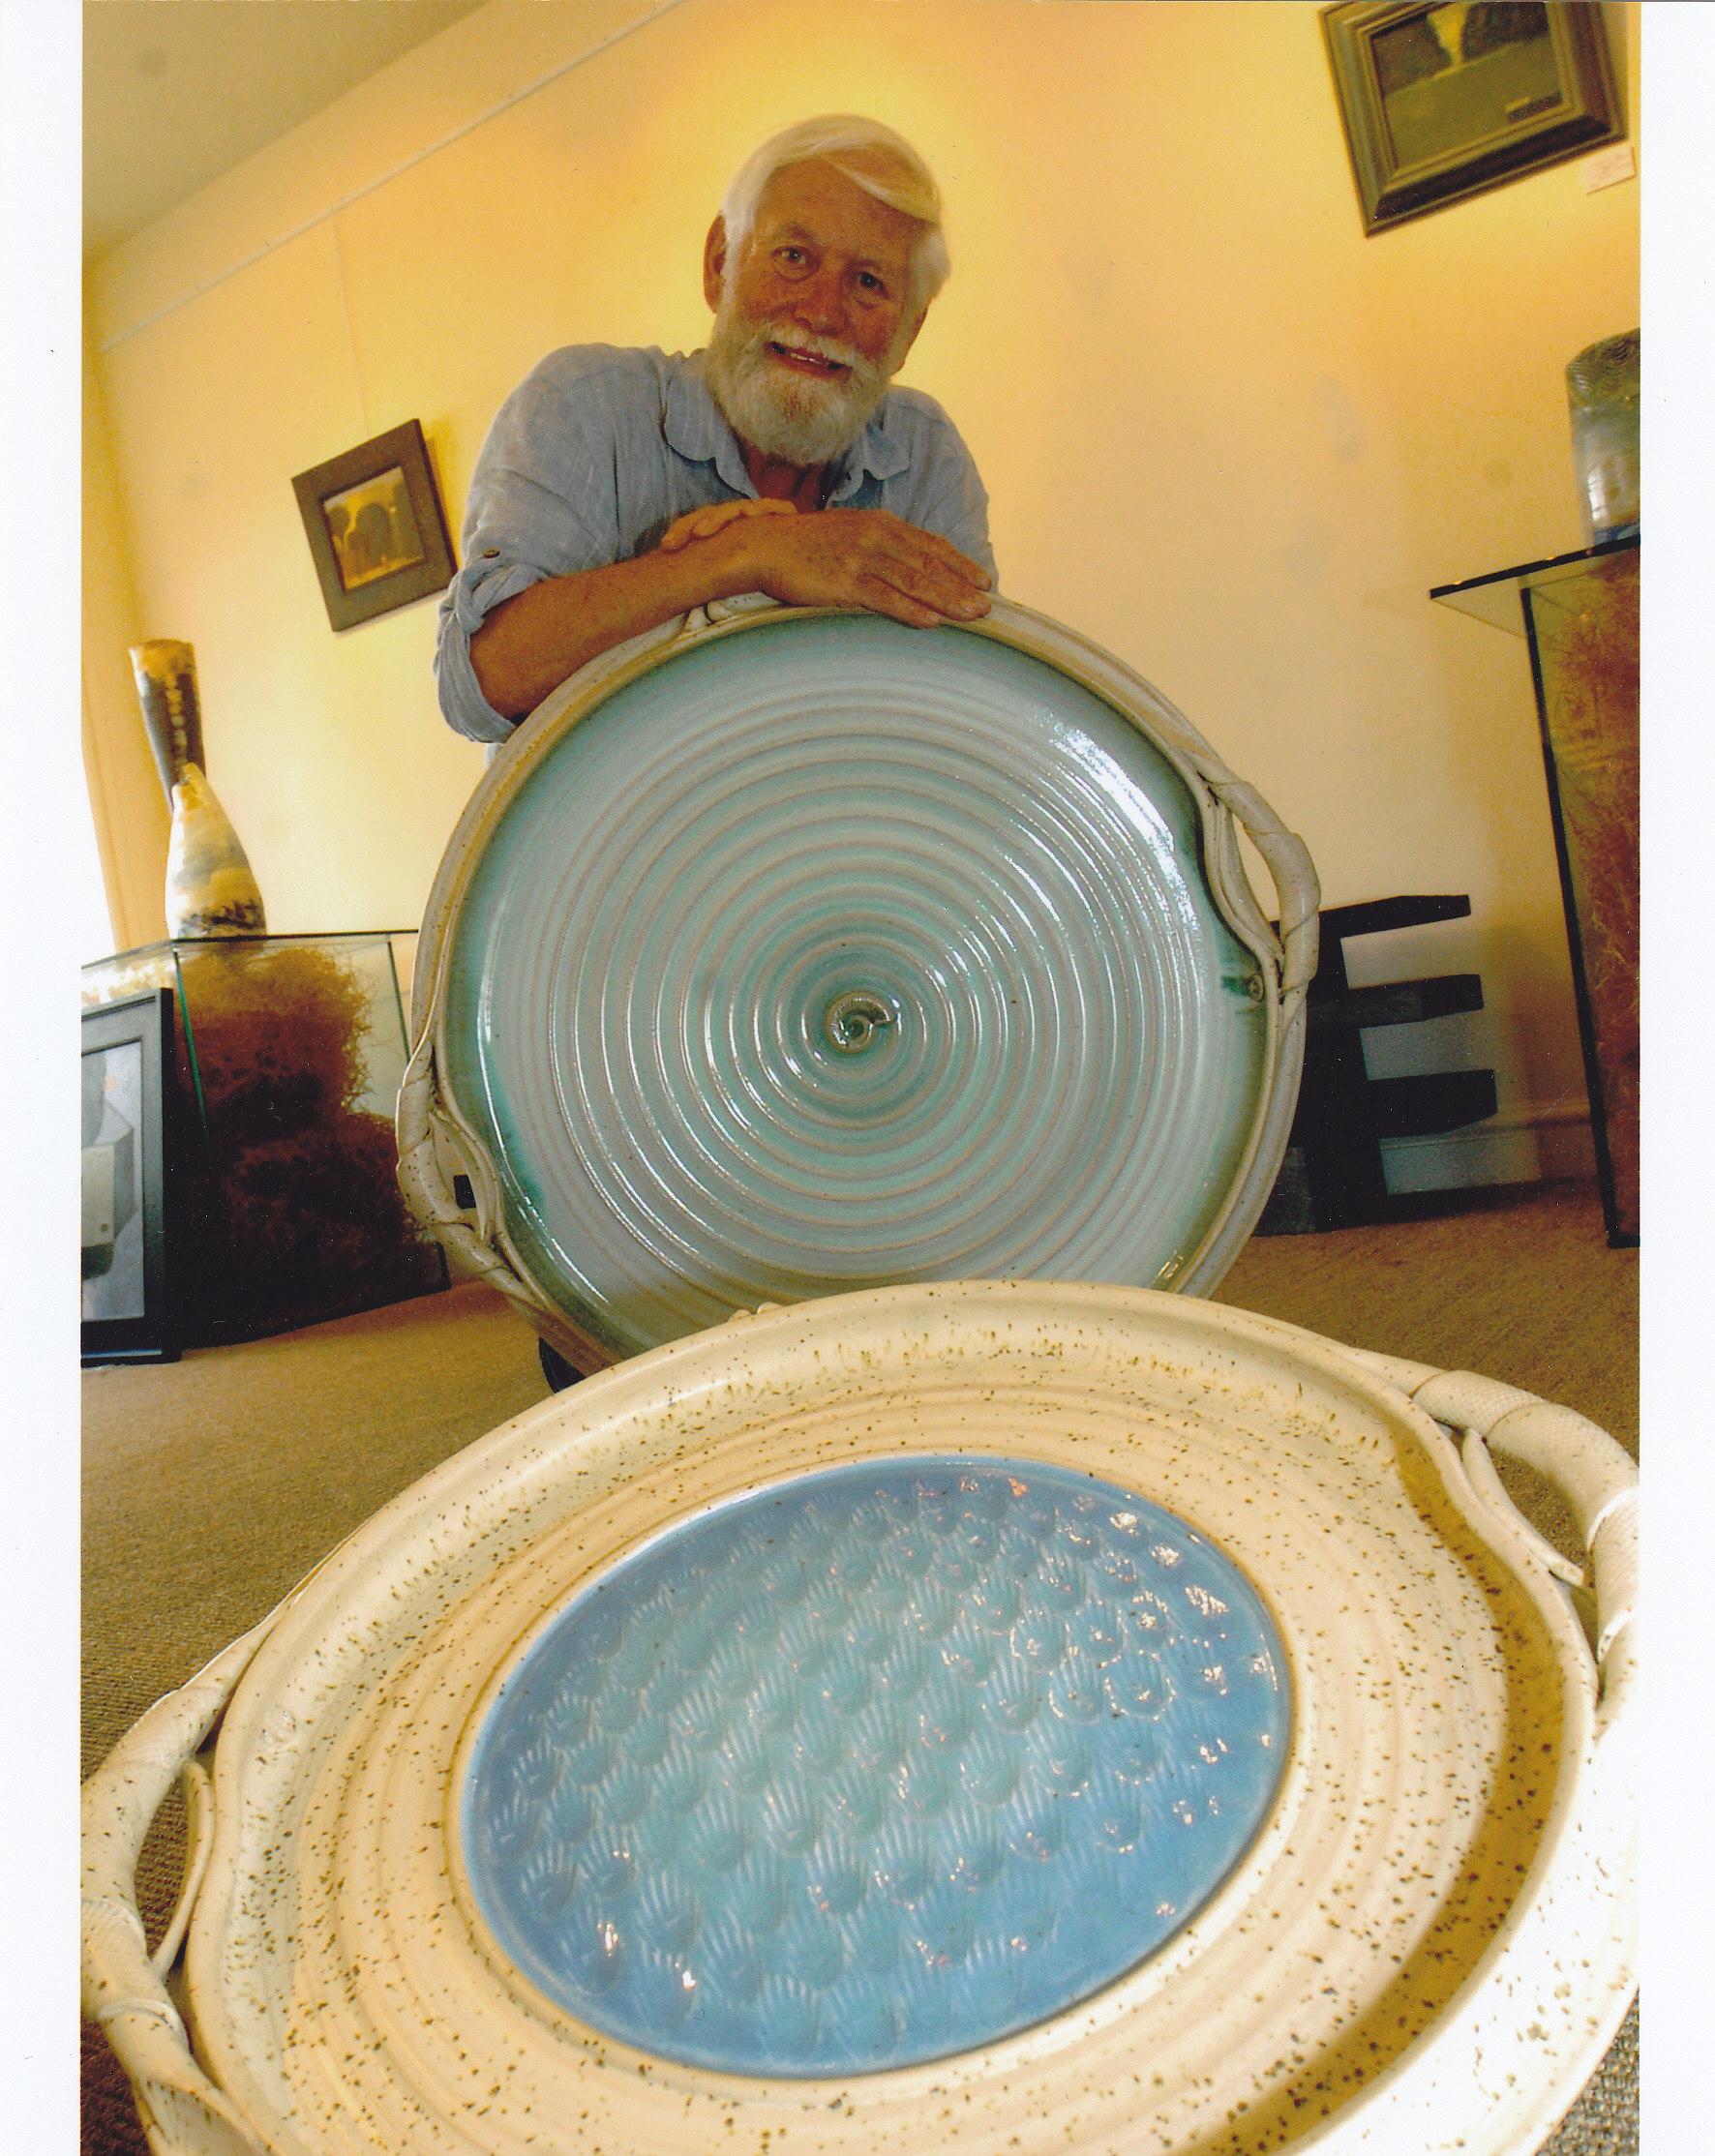 Mike Braisher 2.jpg grand Banquet Platters